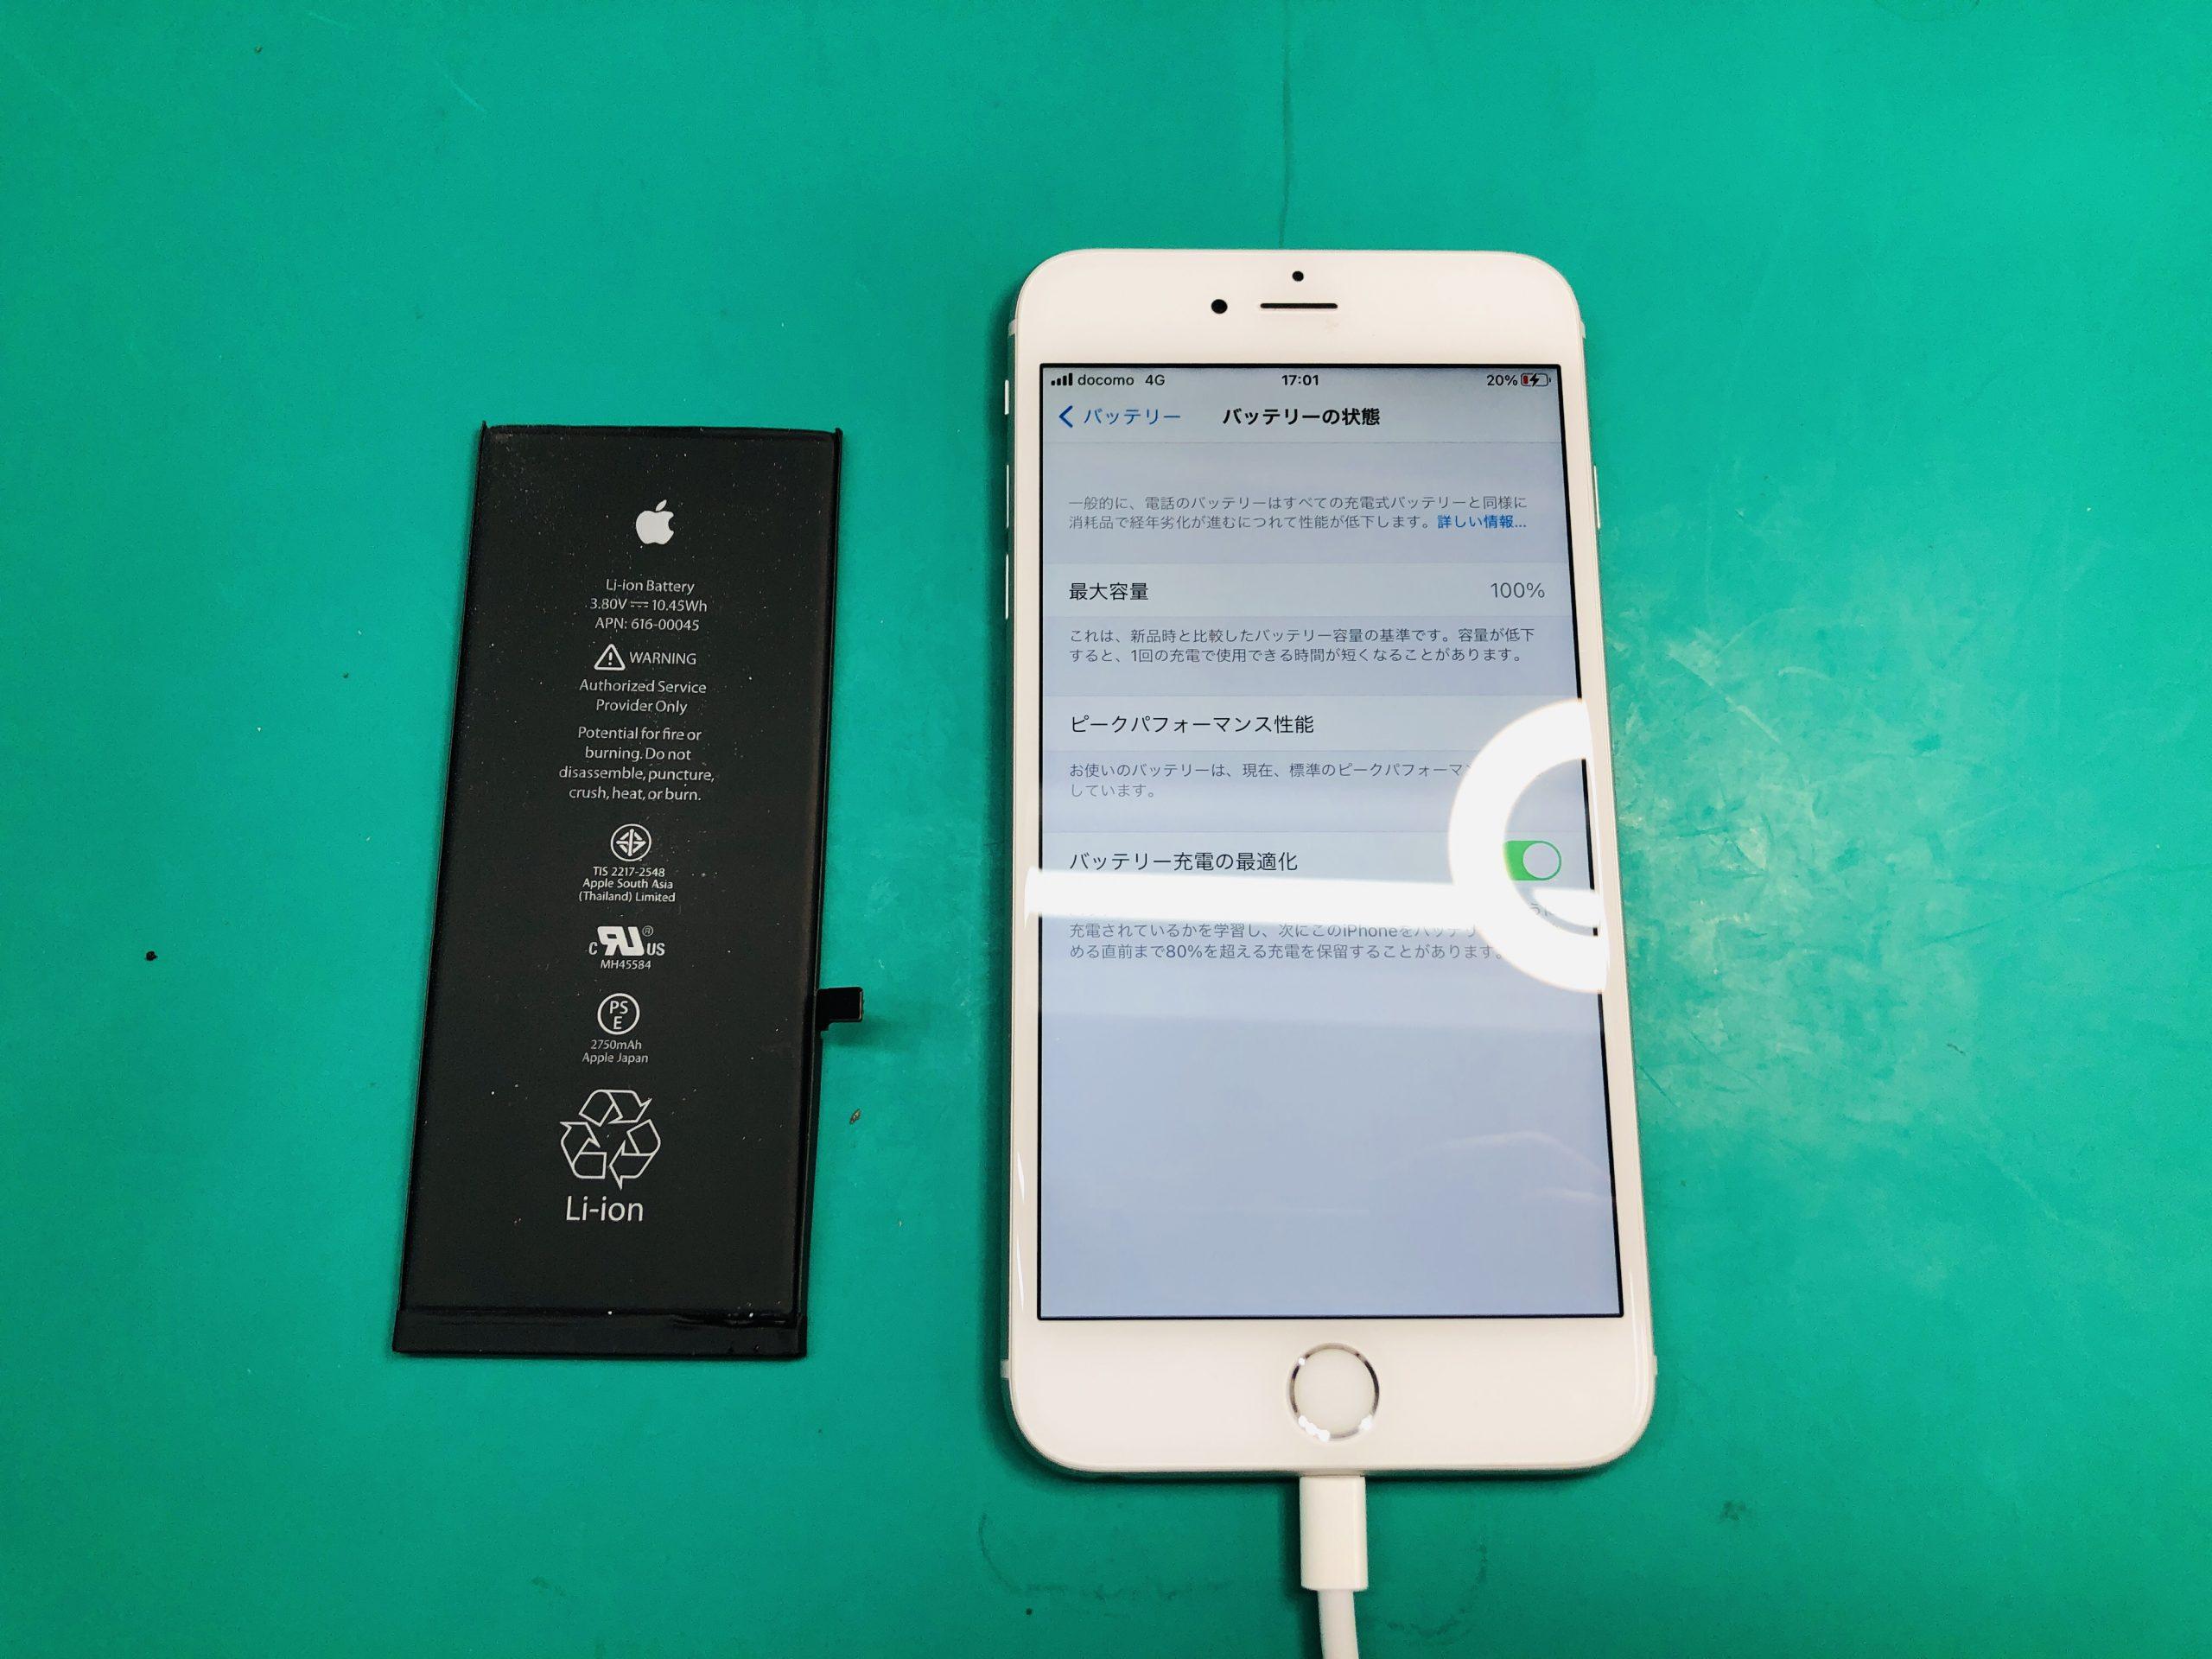 iPhone6s Plusバッテリー交換で松本市内からご来店頂きました